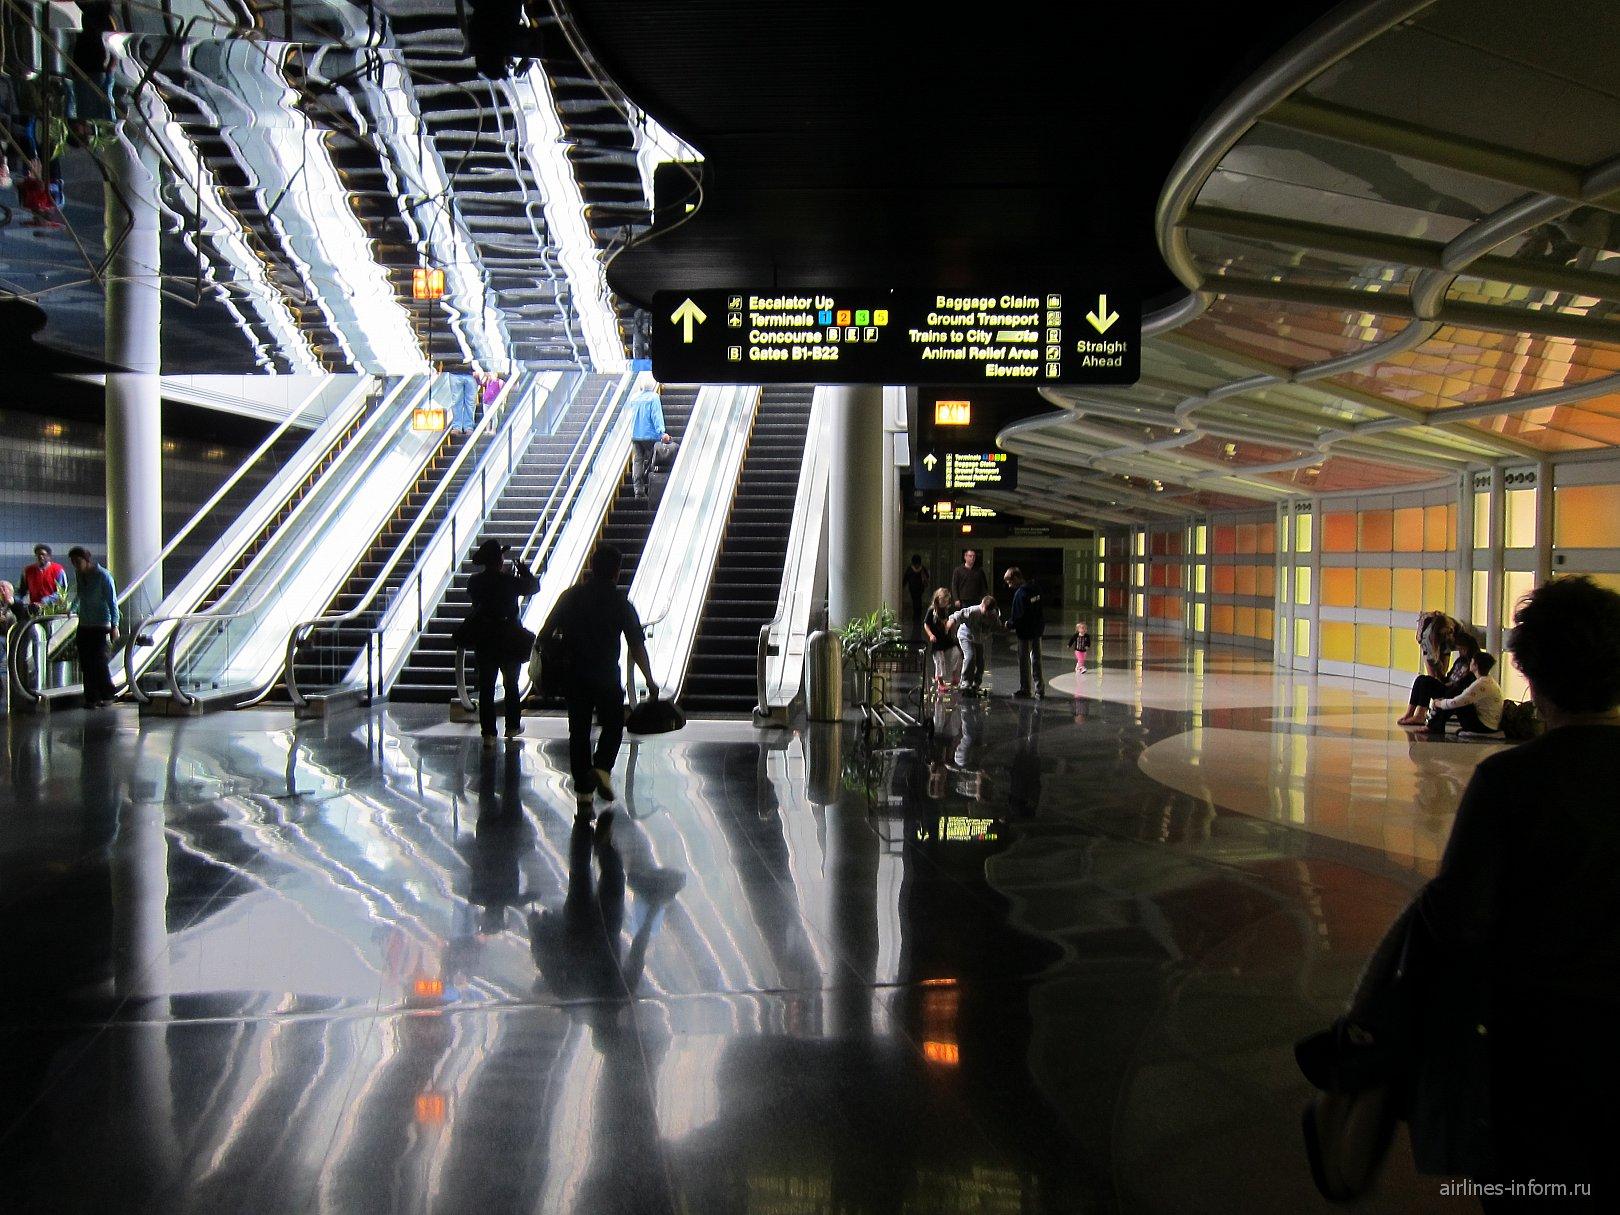 В аэропорту Чикаго О'Хара